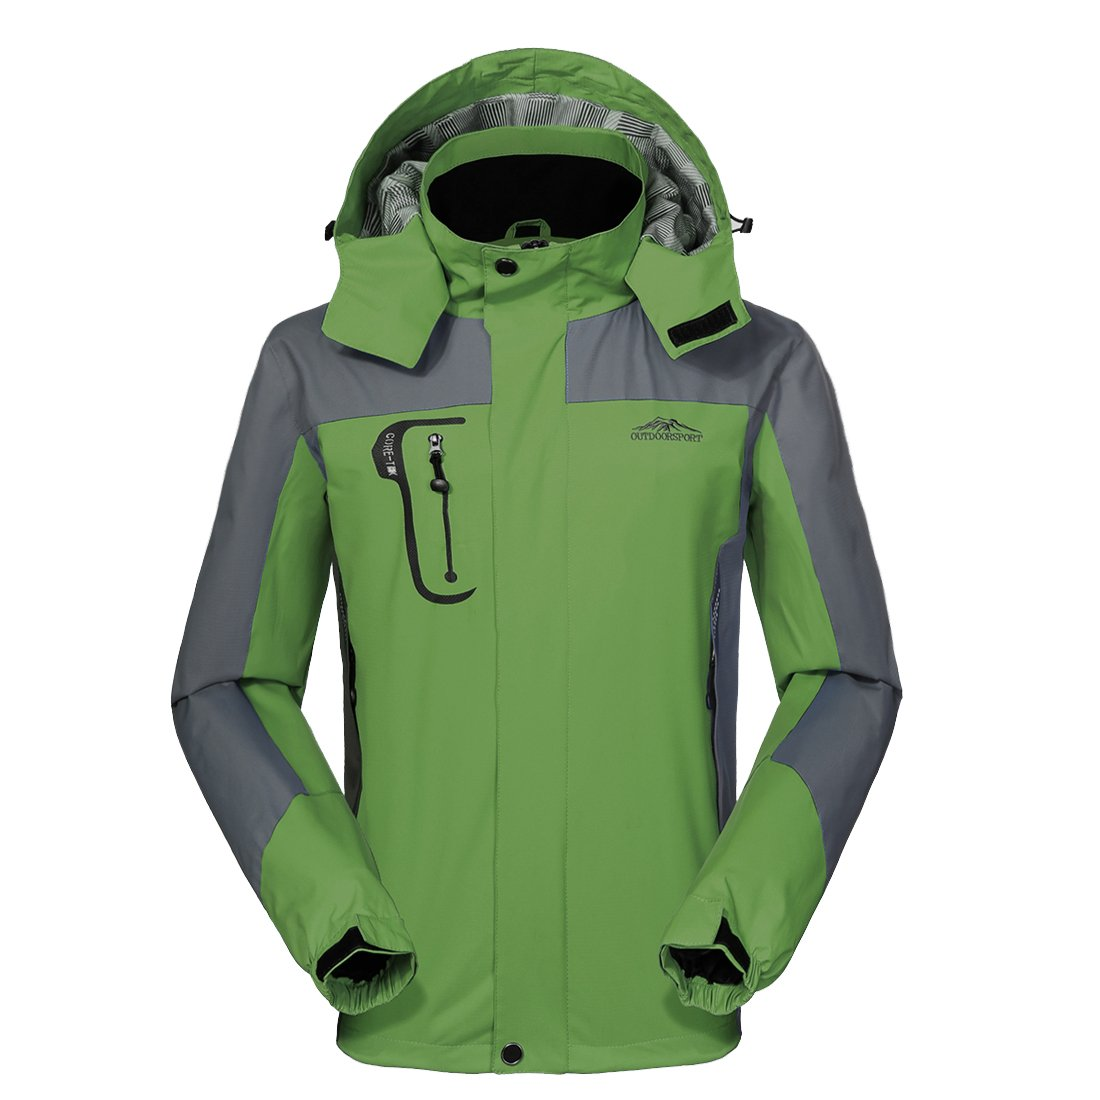 a9ff7f5a0f Waterproof Jacket Mens Raincoats-GIVBRO New Design Outdoor Hooded  Lightweight Softshell Hiking Windproof Rain Jackets